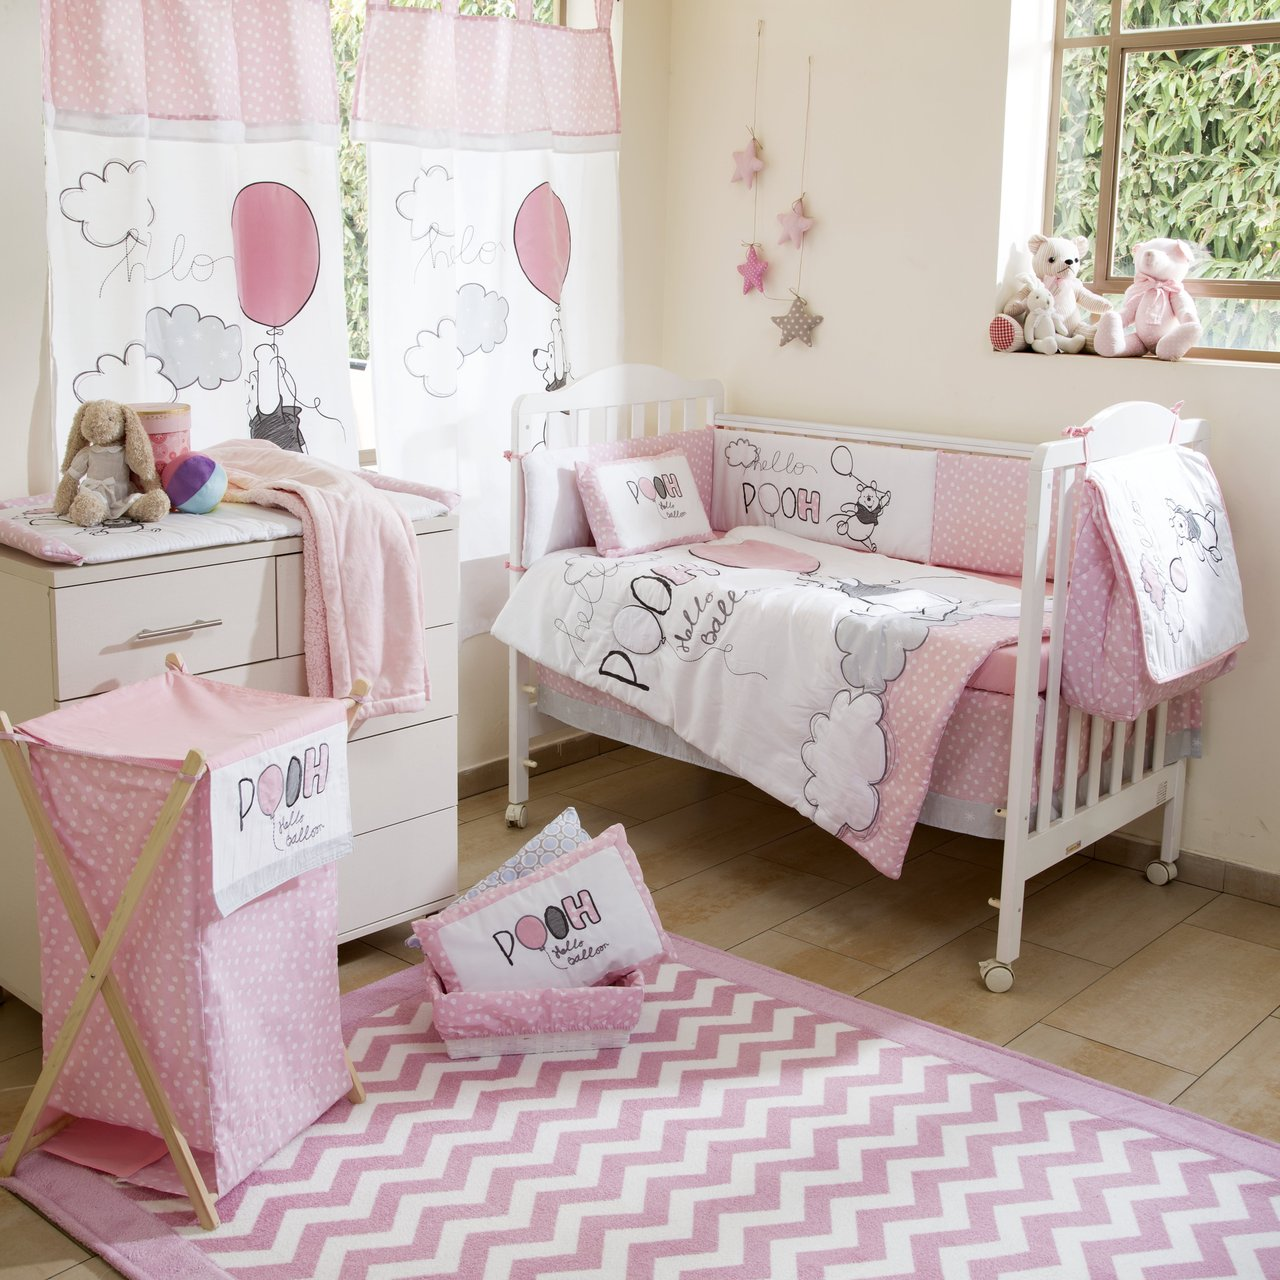 Disney Pink Winnie The Pooh Play Crib Bedding Set